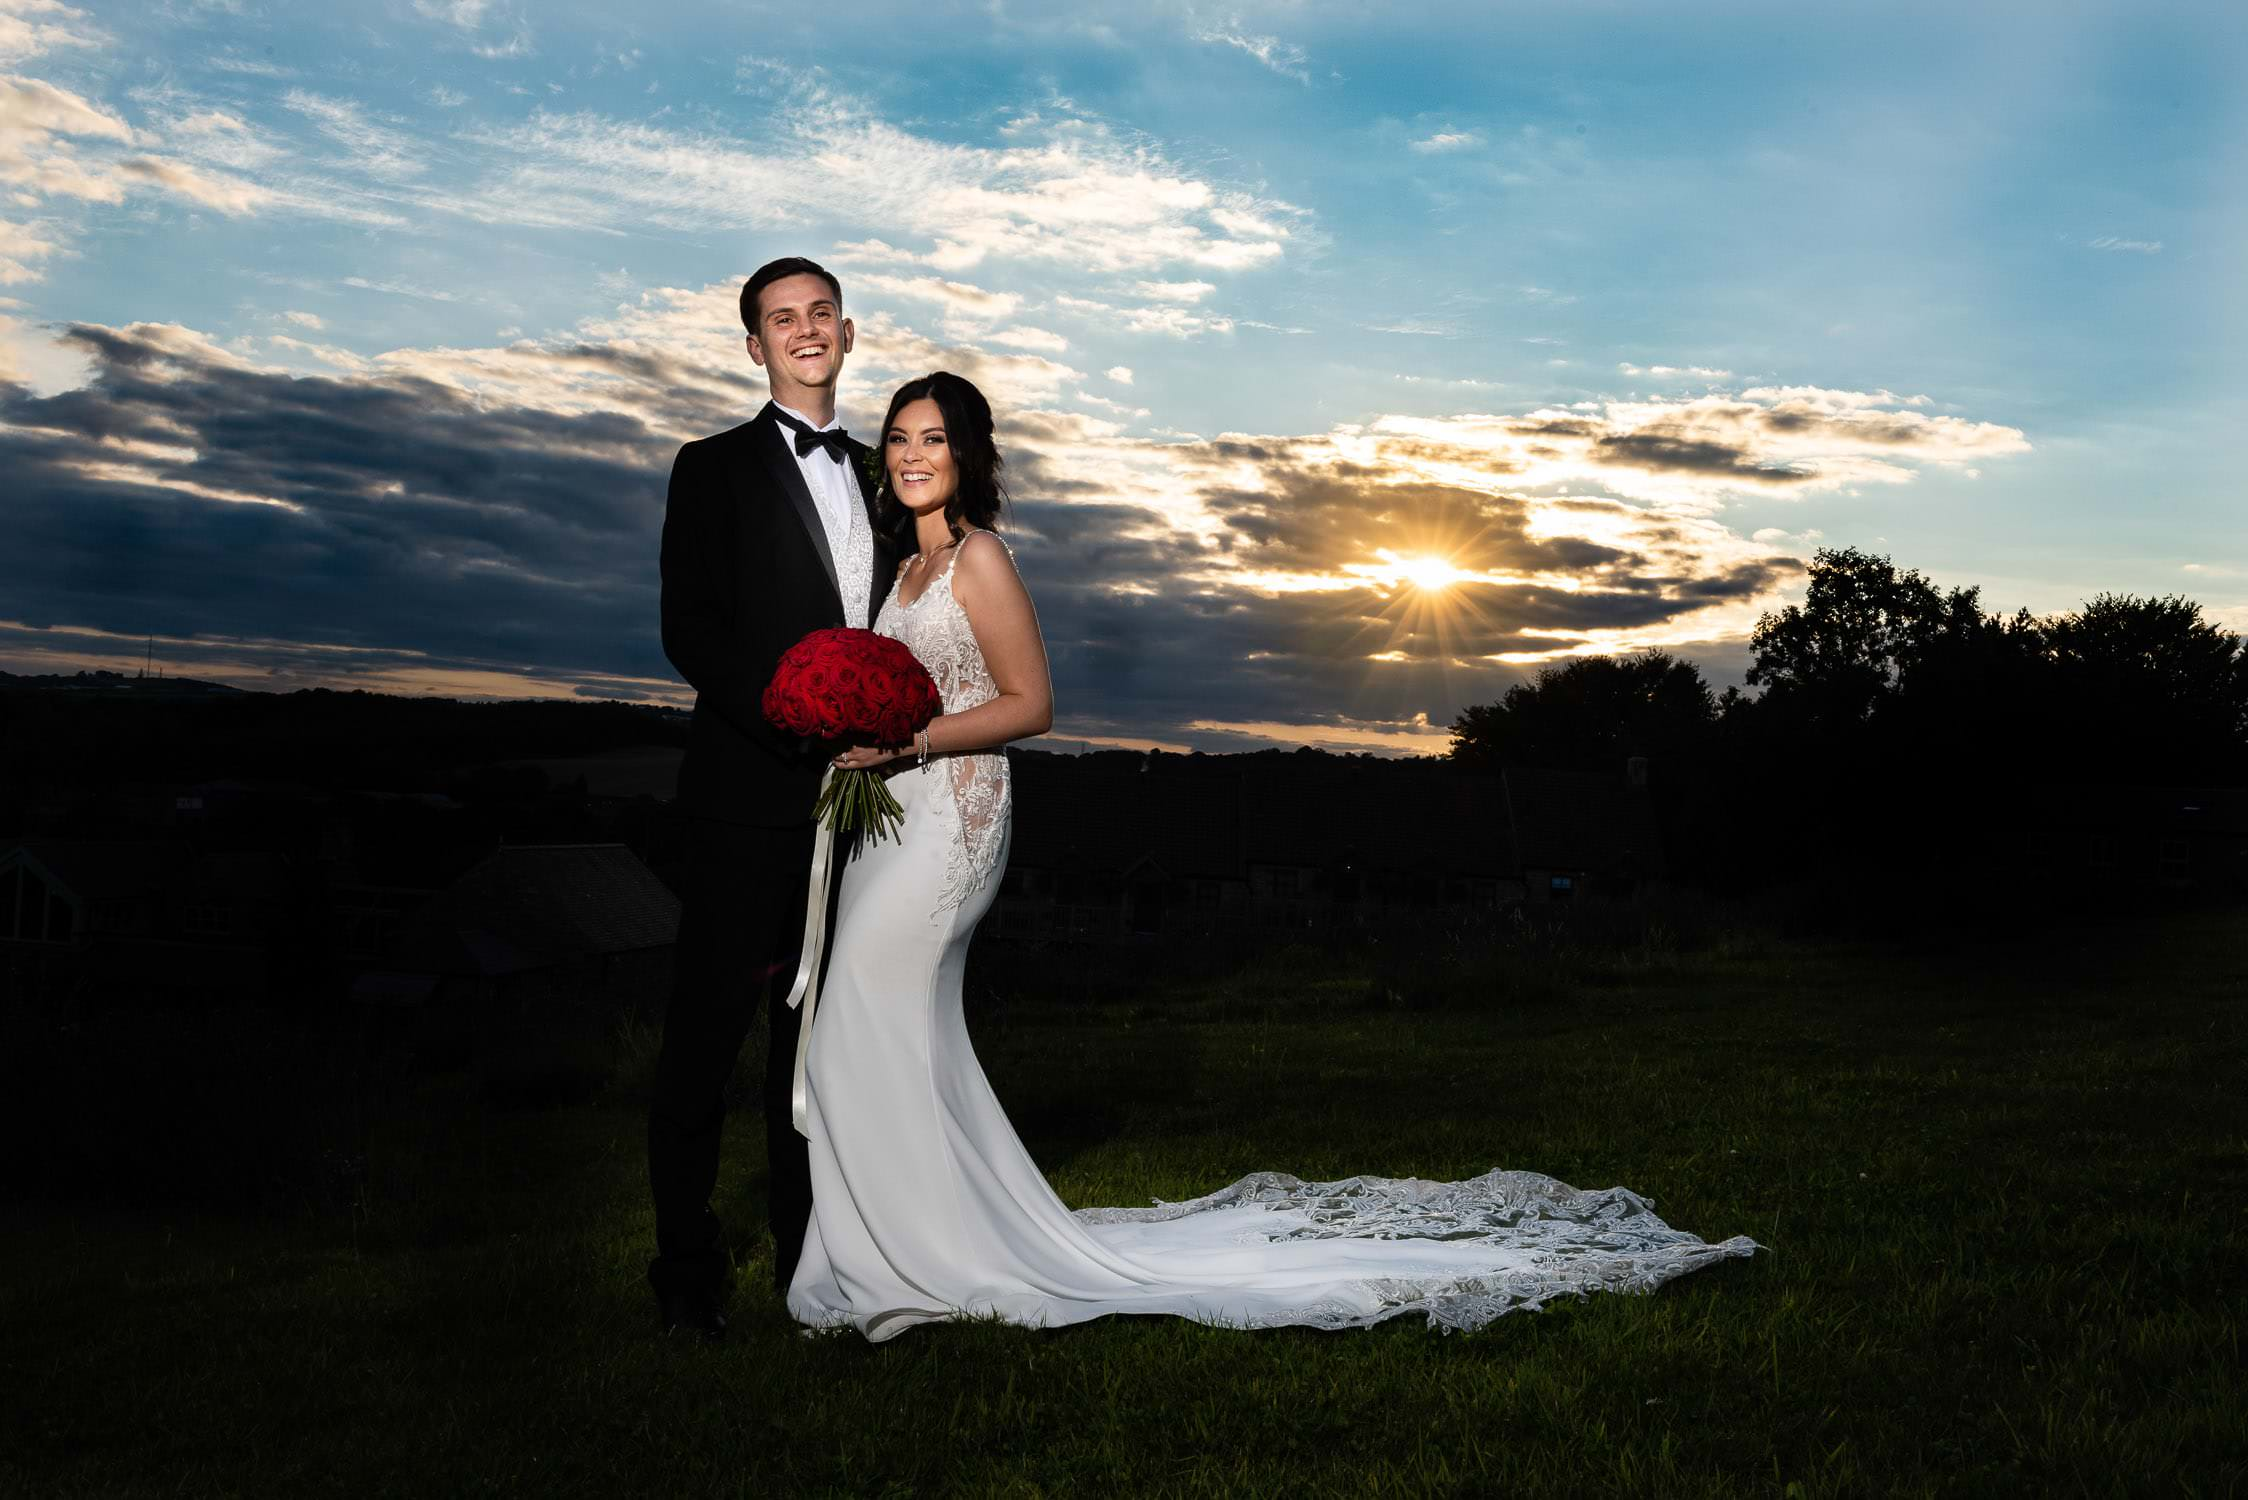 Black Horse Beamish Weddings, wedding photography